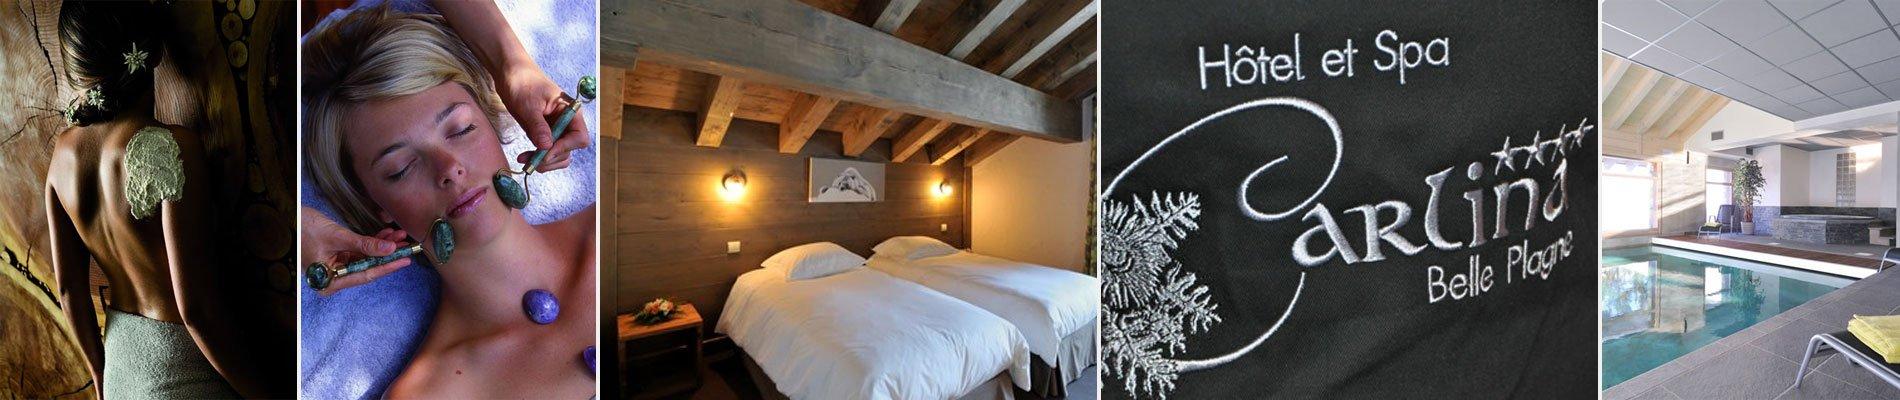 hotel-spa-carlina-belle-plagne